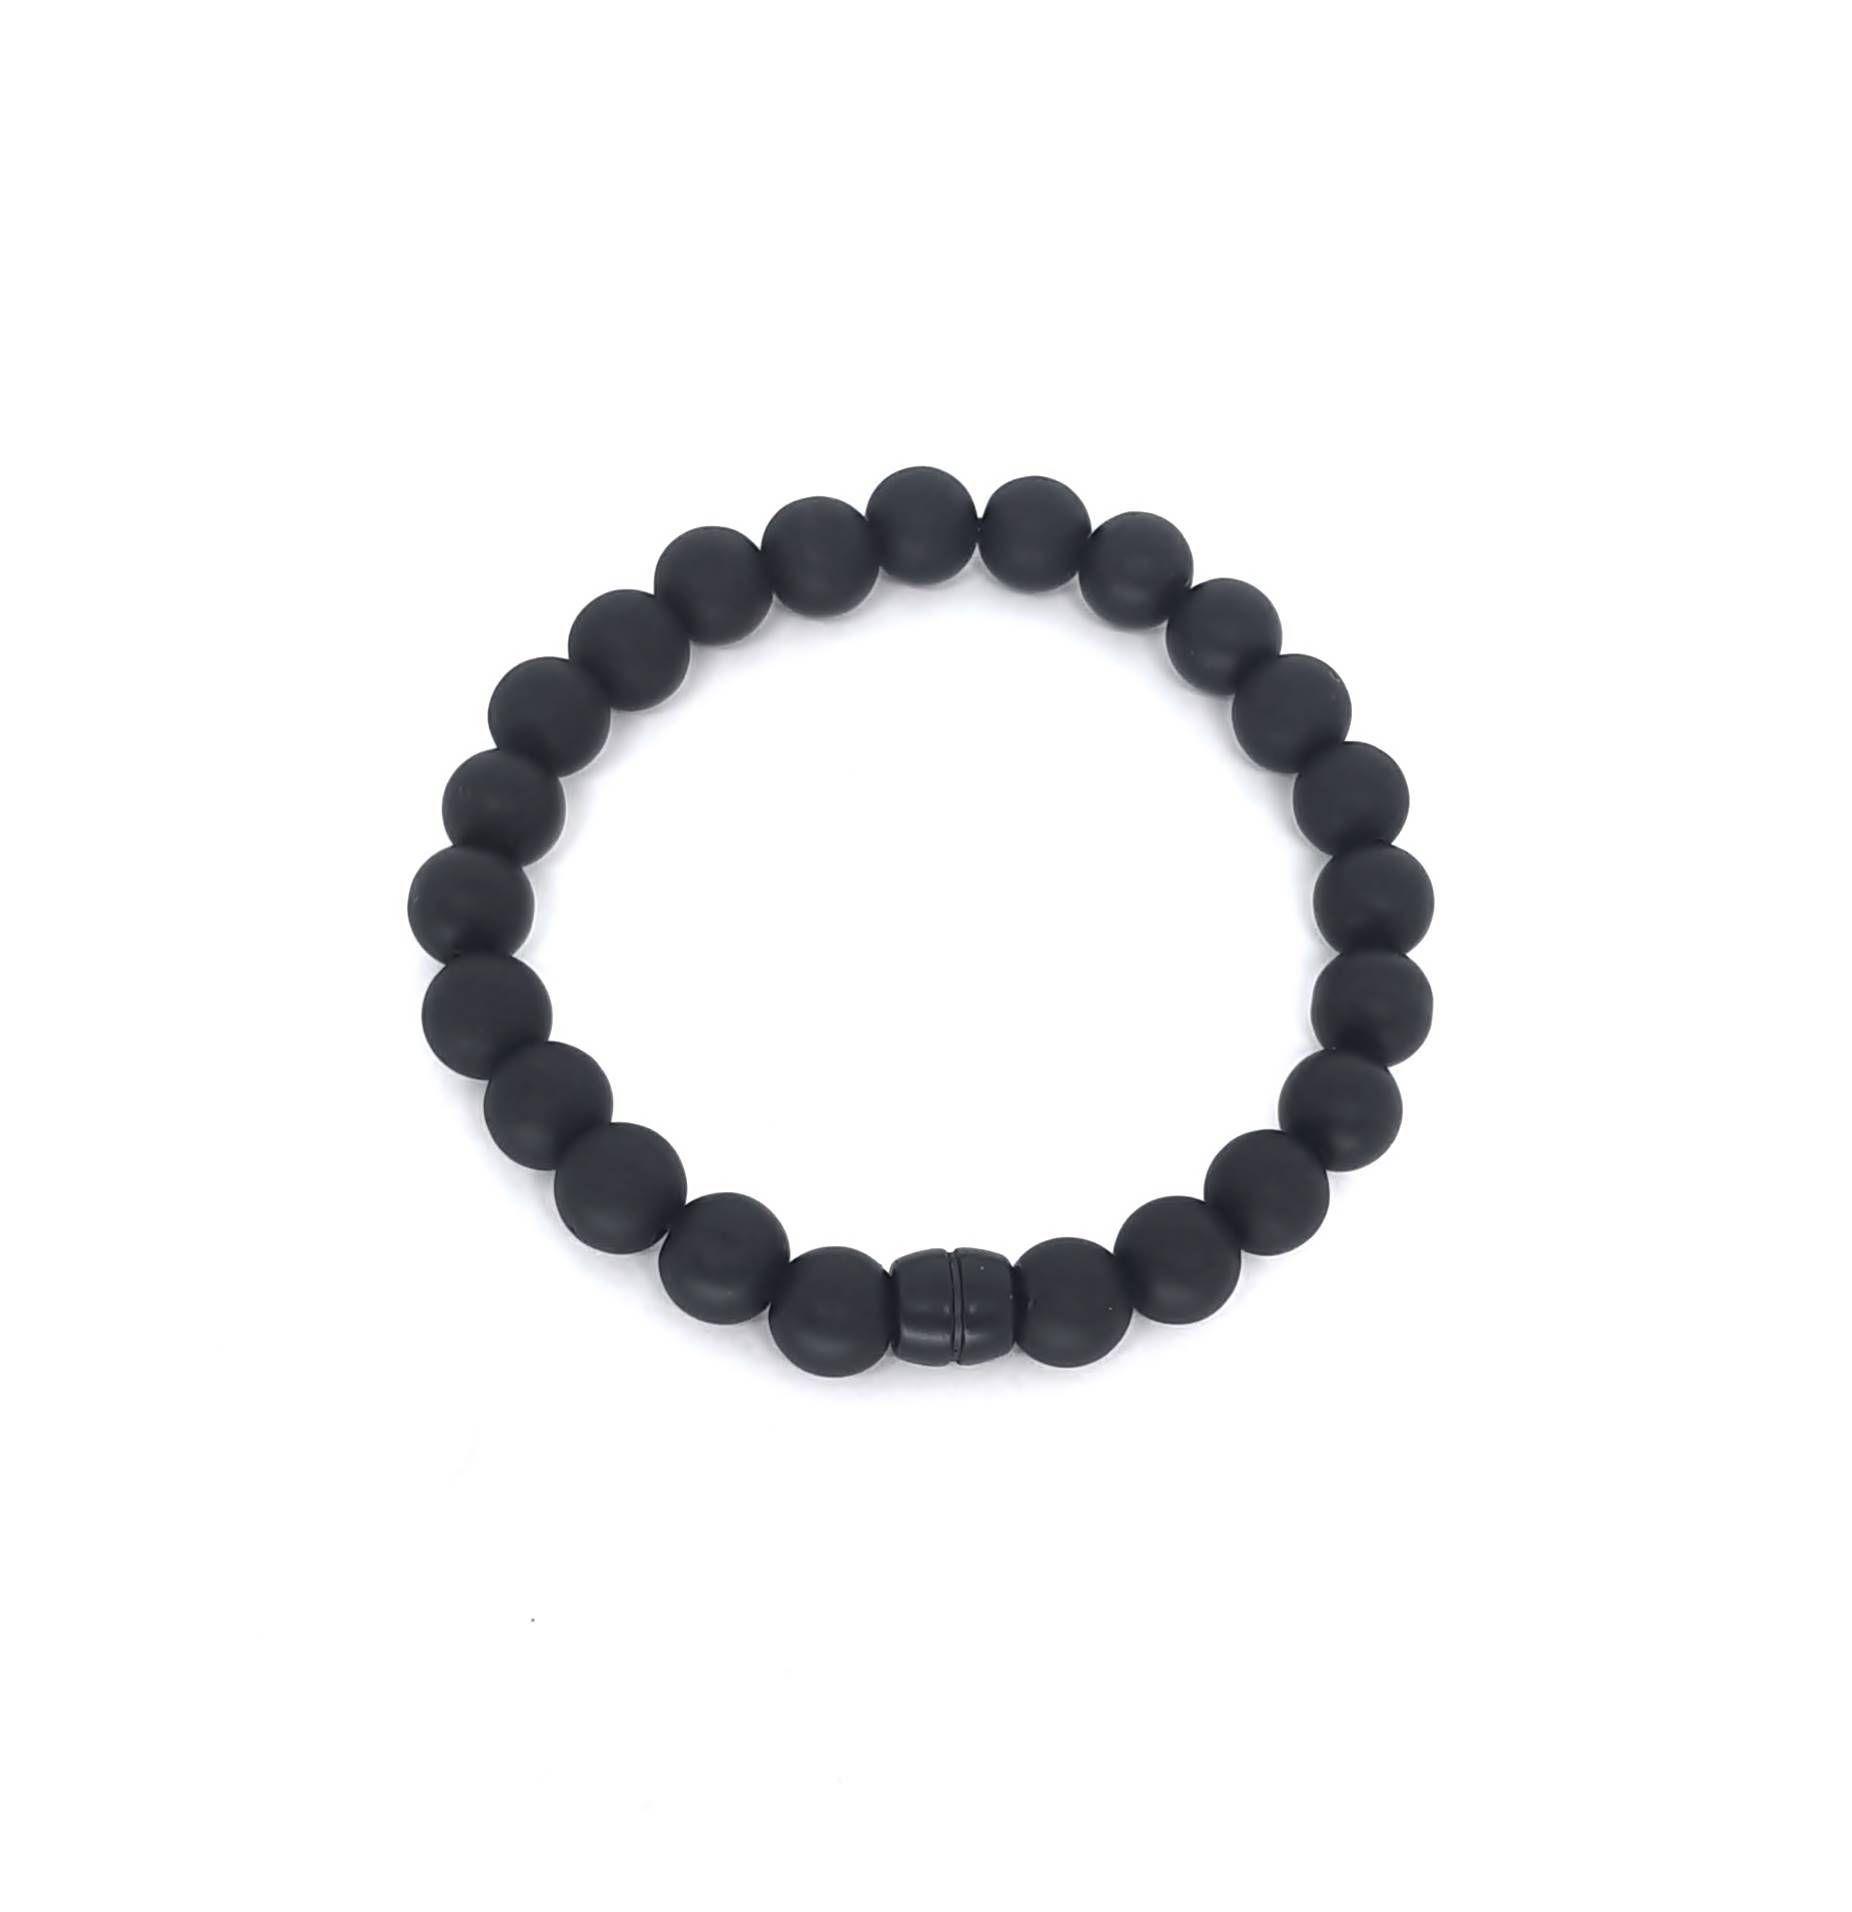 Pulseira de Pedras  Black Series Tube Matte